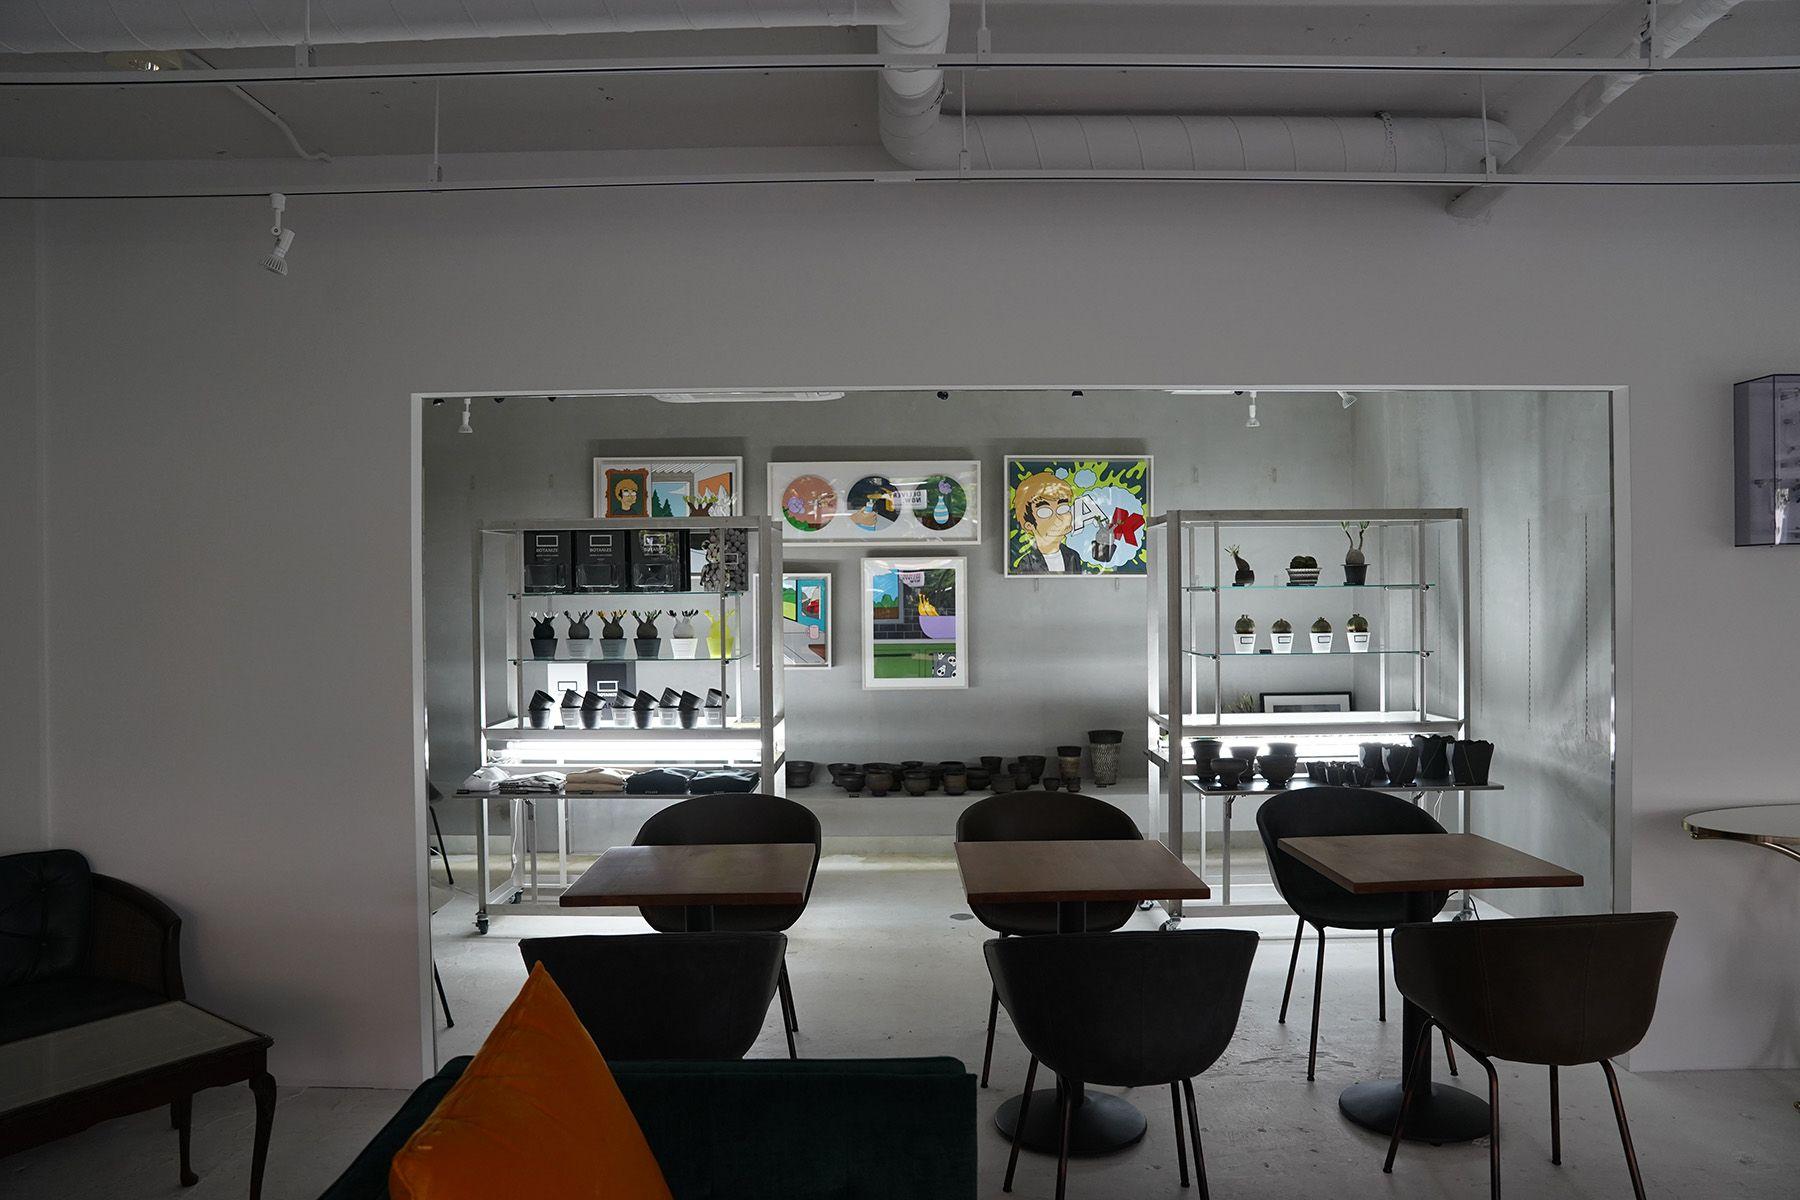 ANEA CAFÉ  松見坂/店舗 (アネアカフェ マツミザカ)ギャラリースペース